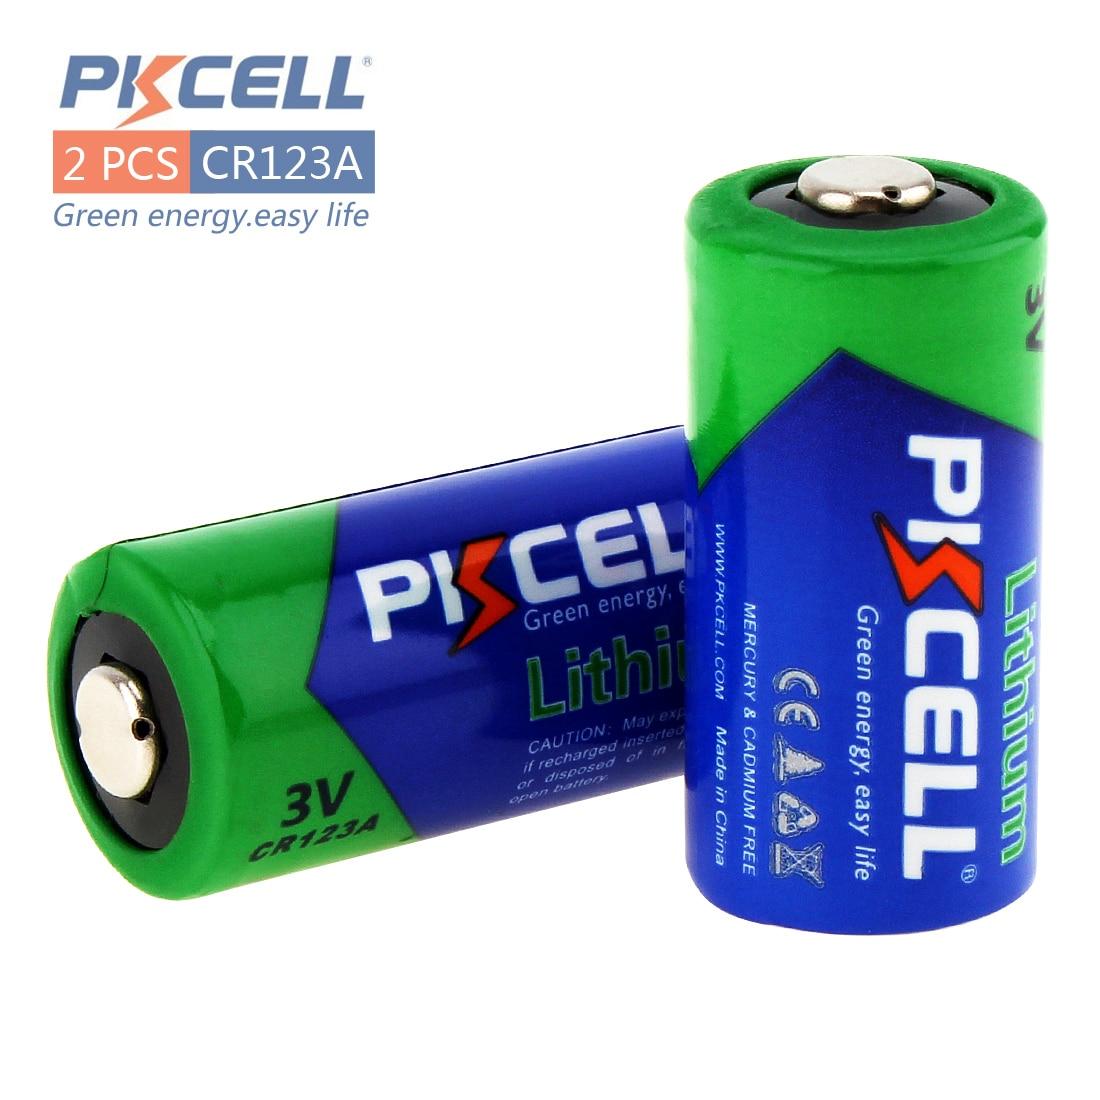 PKCELL 2Pcs 2 3A CR123A CR123 CR 123 CR17335 123A CR17345 CR17335 16340 3V Lithium Battery